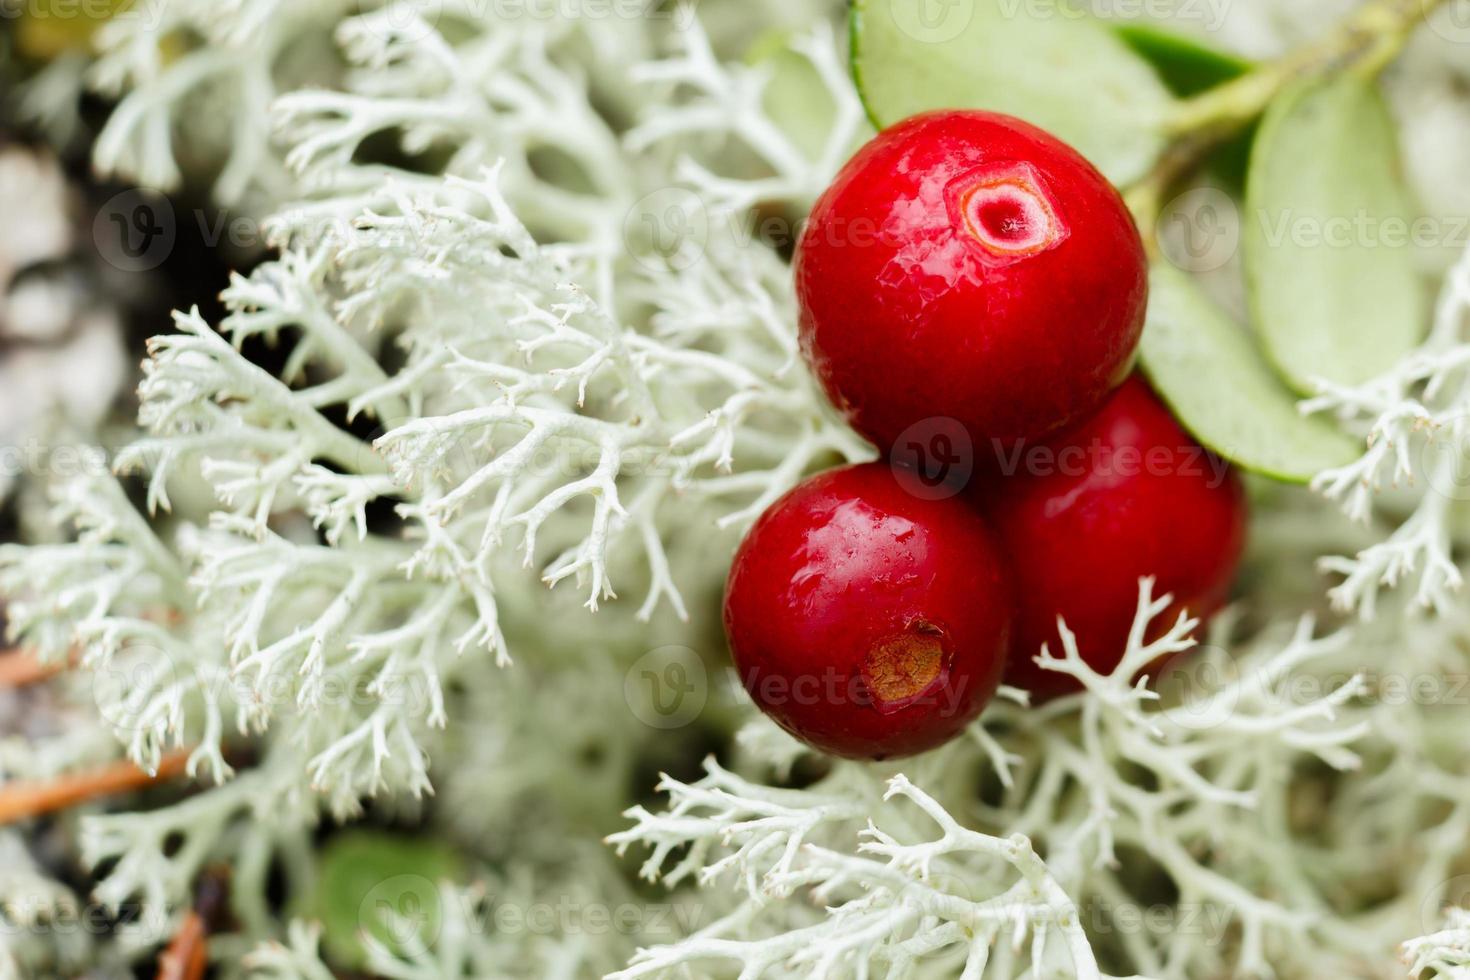 cowberry (mirtillo rosso, mirtillo rosso) foto